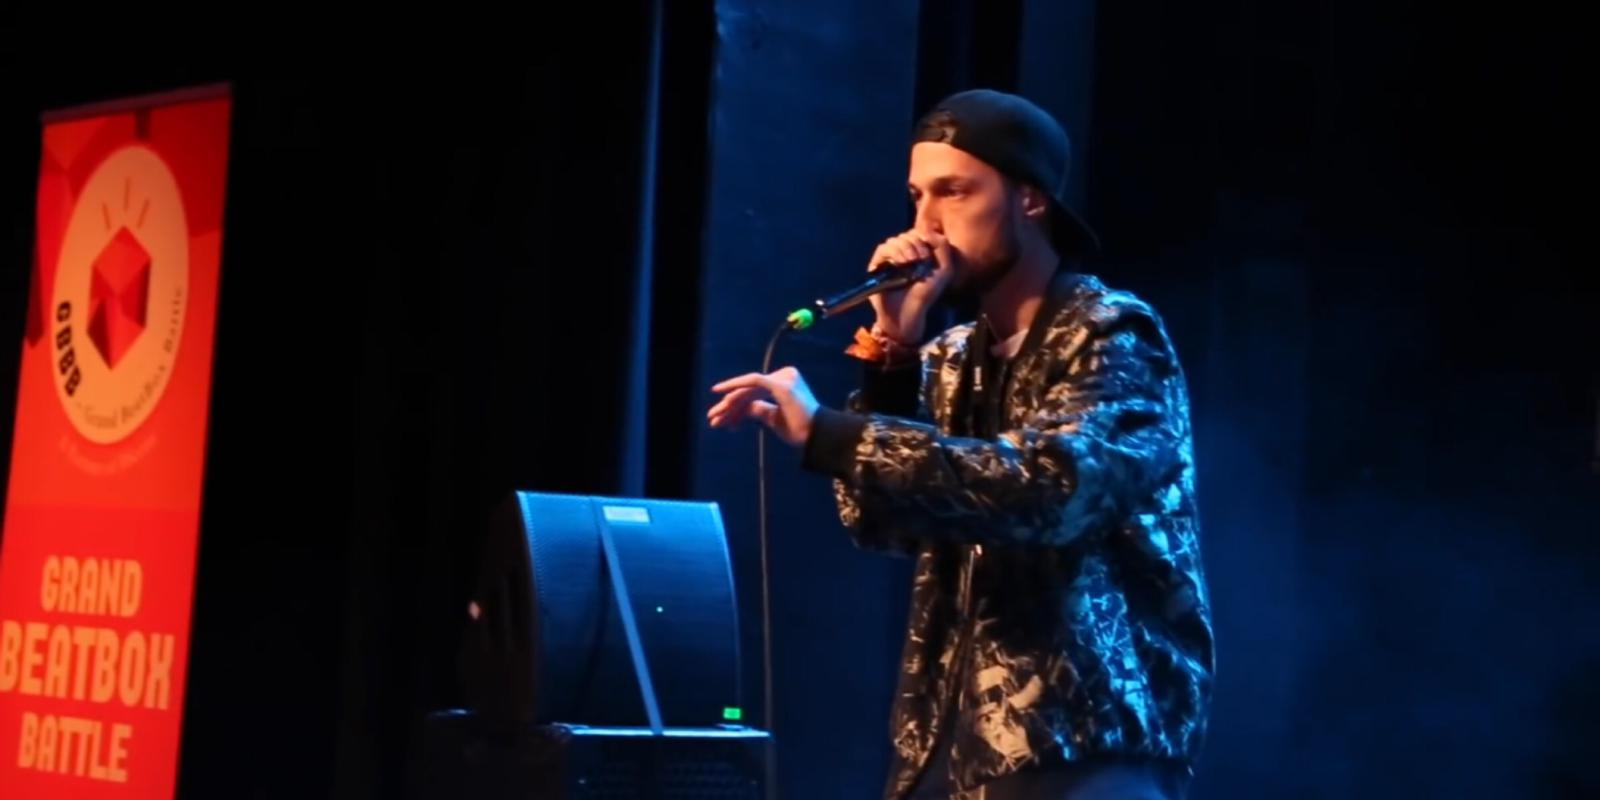 Beatbox-Weltmeister aus Aarau zerlegt Battle-Showcase